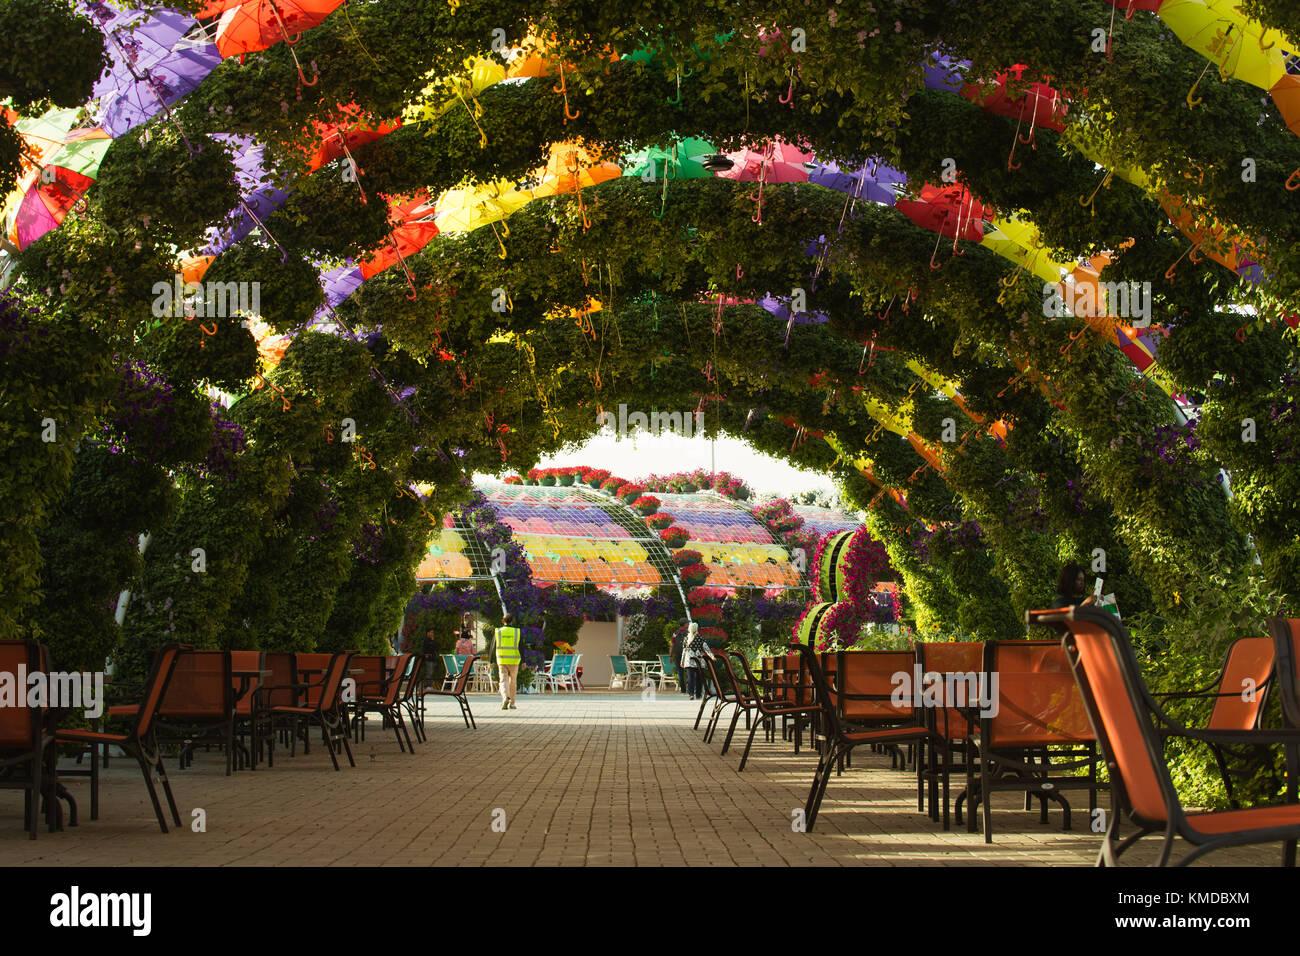 Dubai Miracle Garden Stock Photo: 167481180 - Alamy